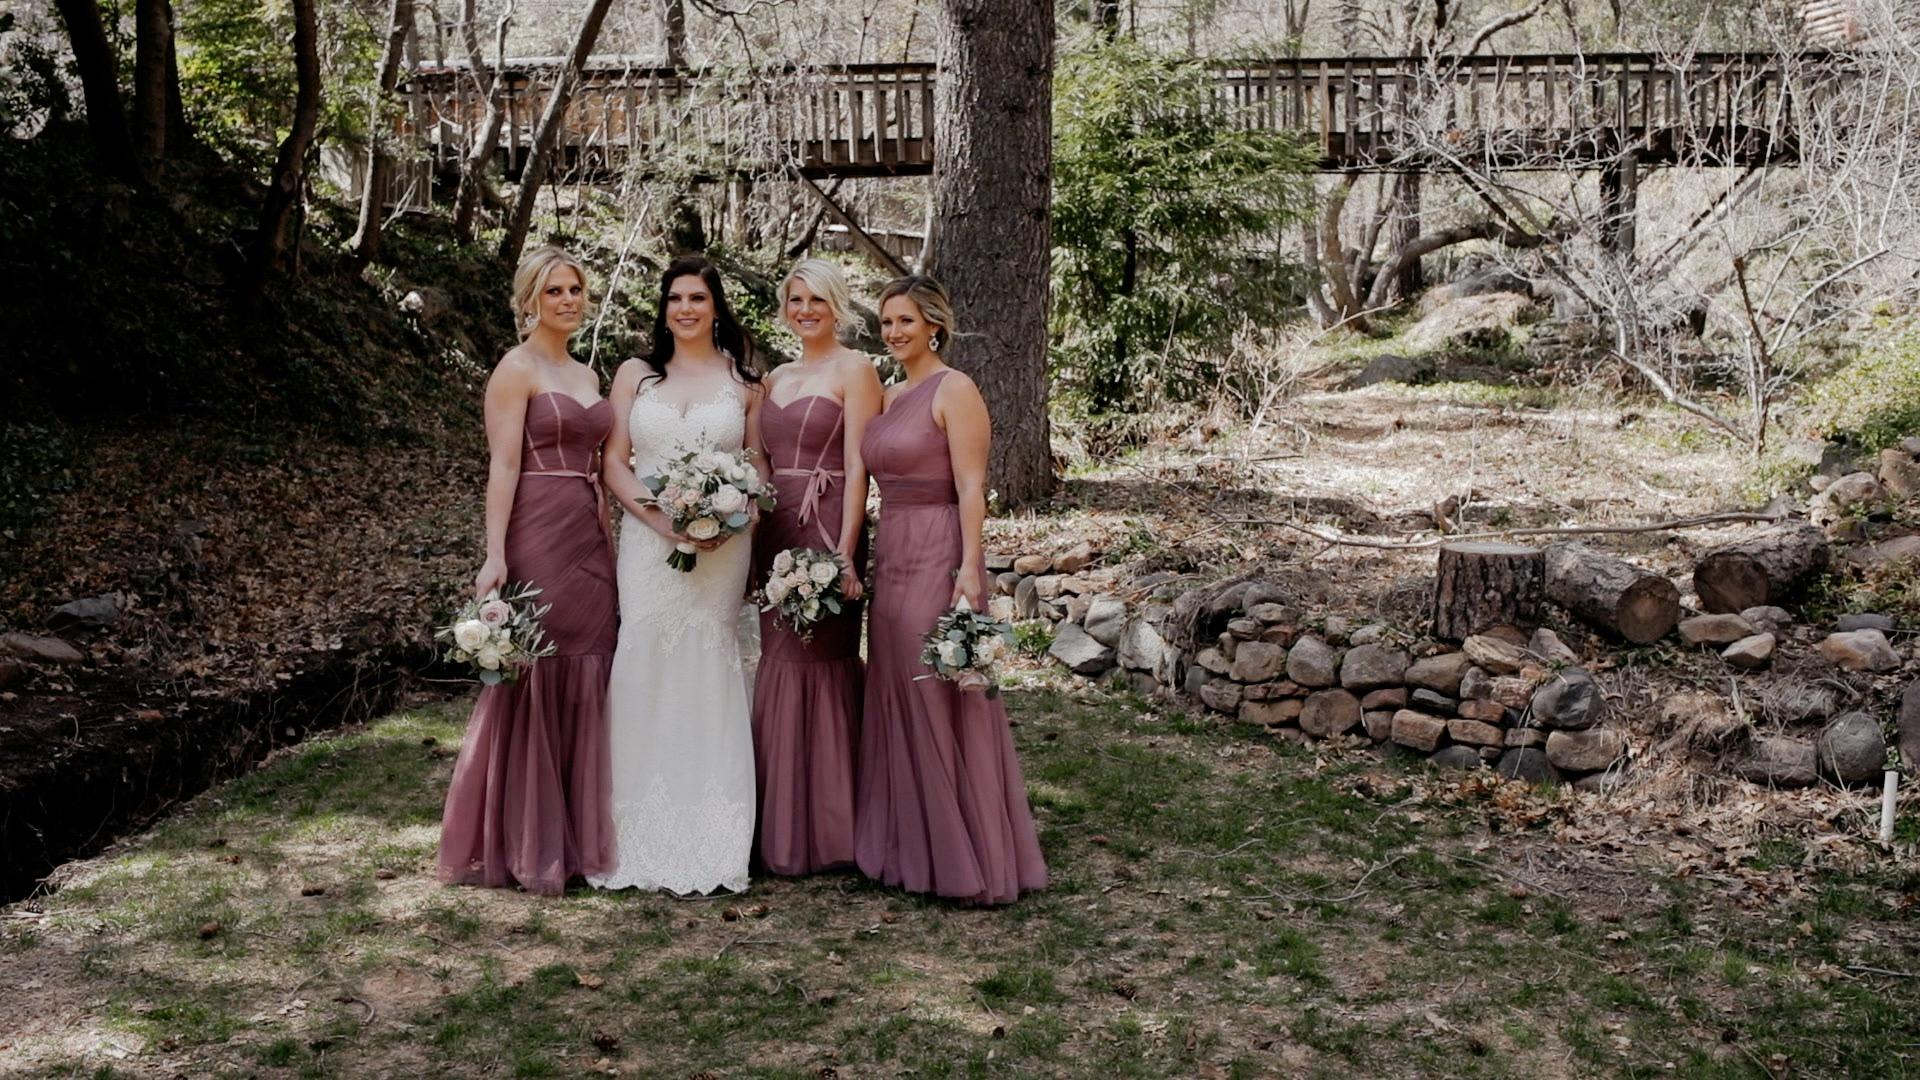 sedona wedding vieography